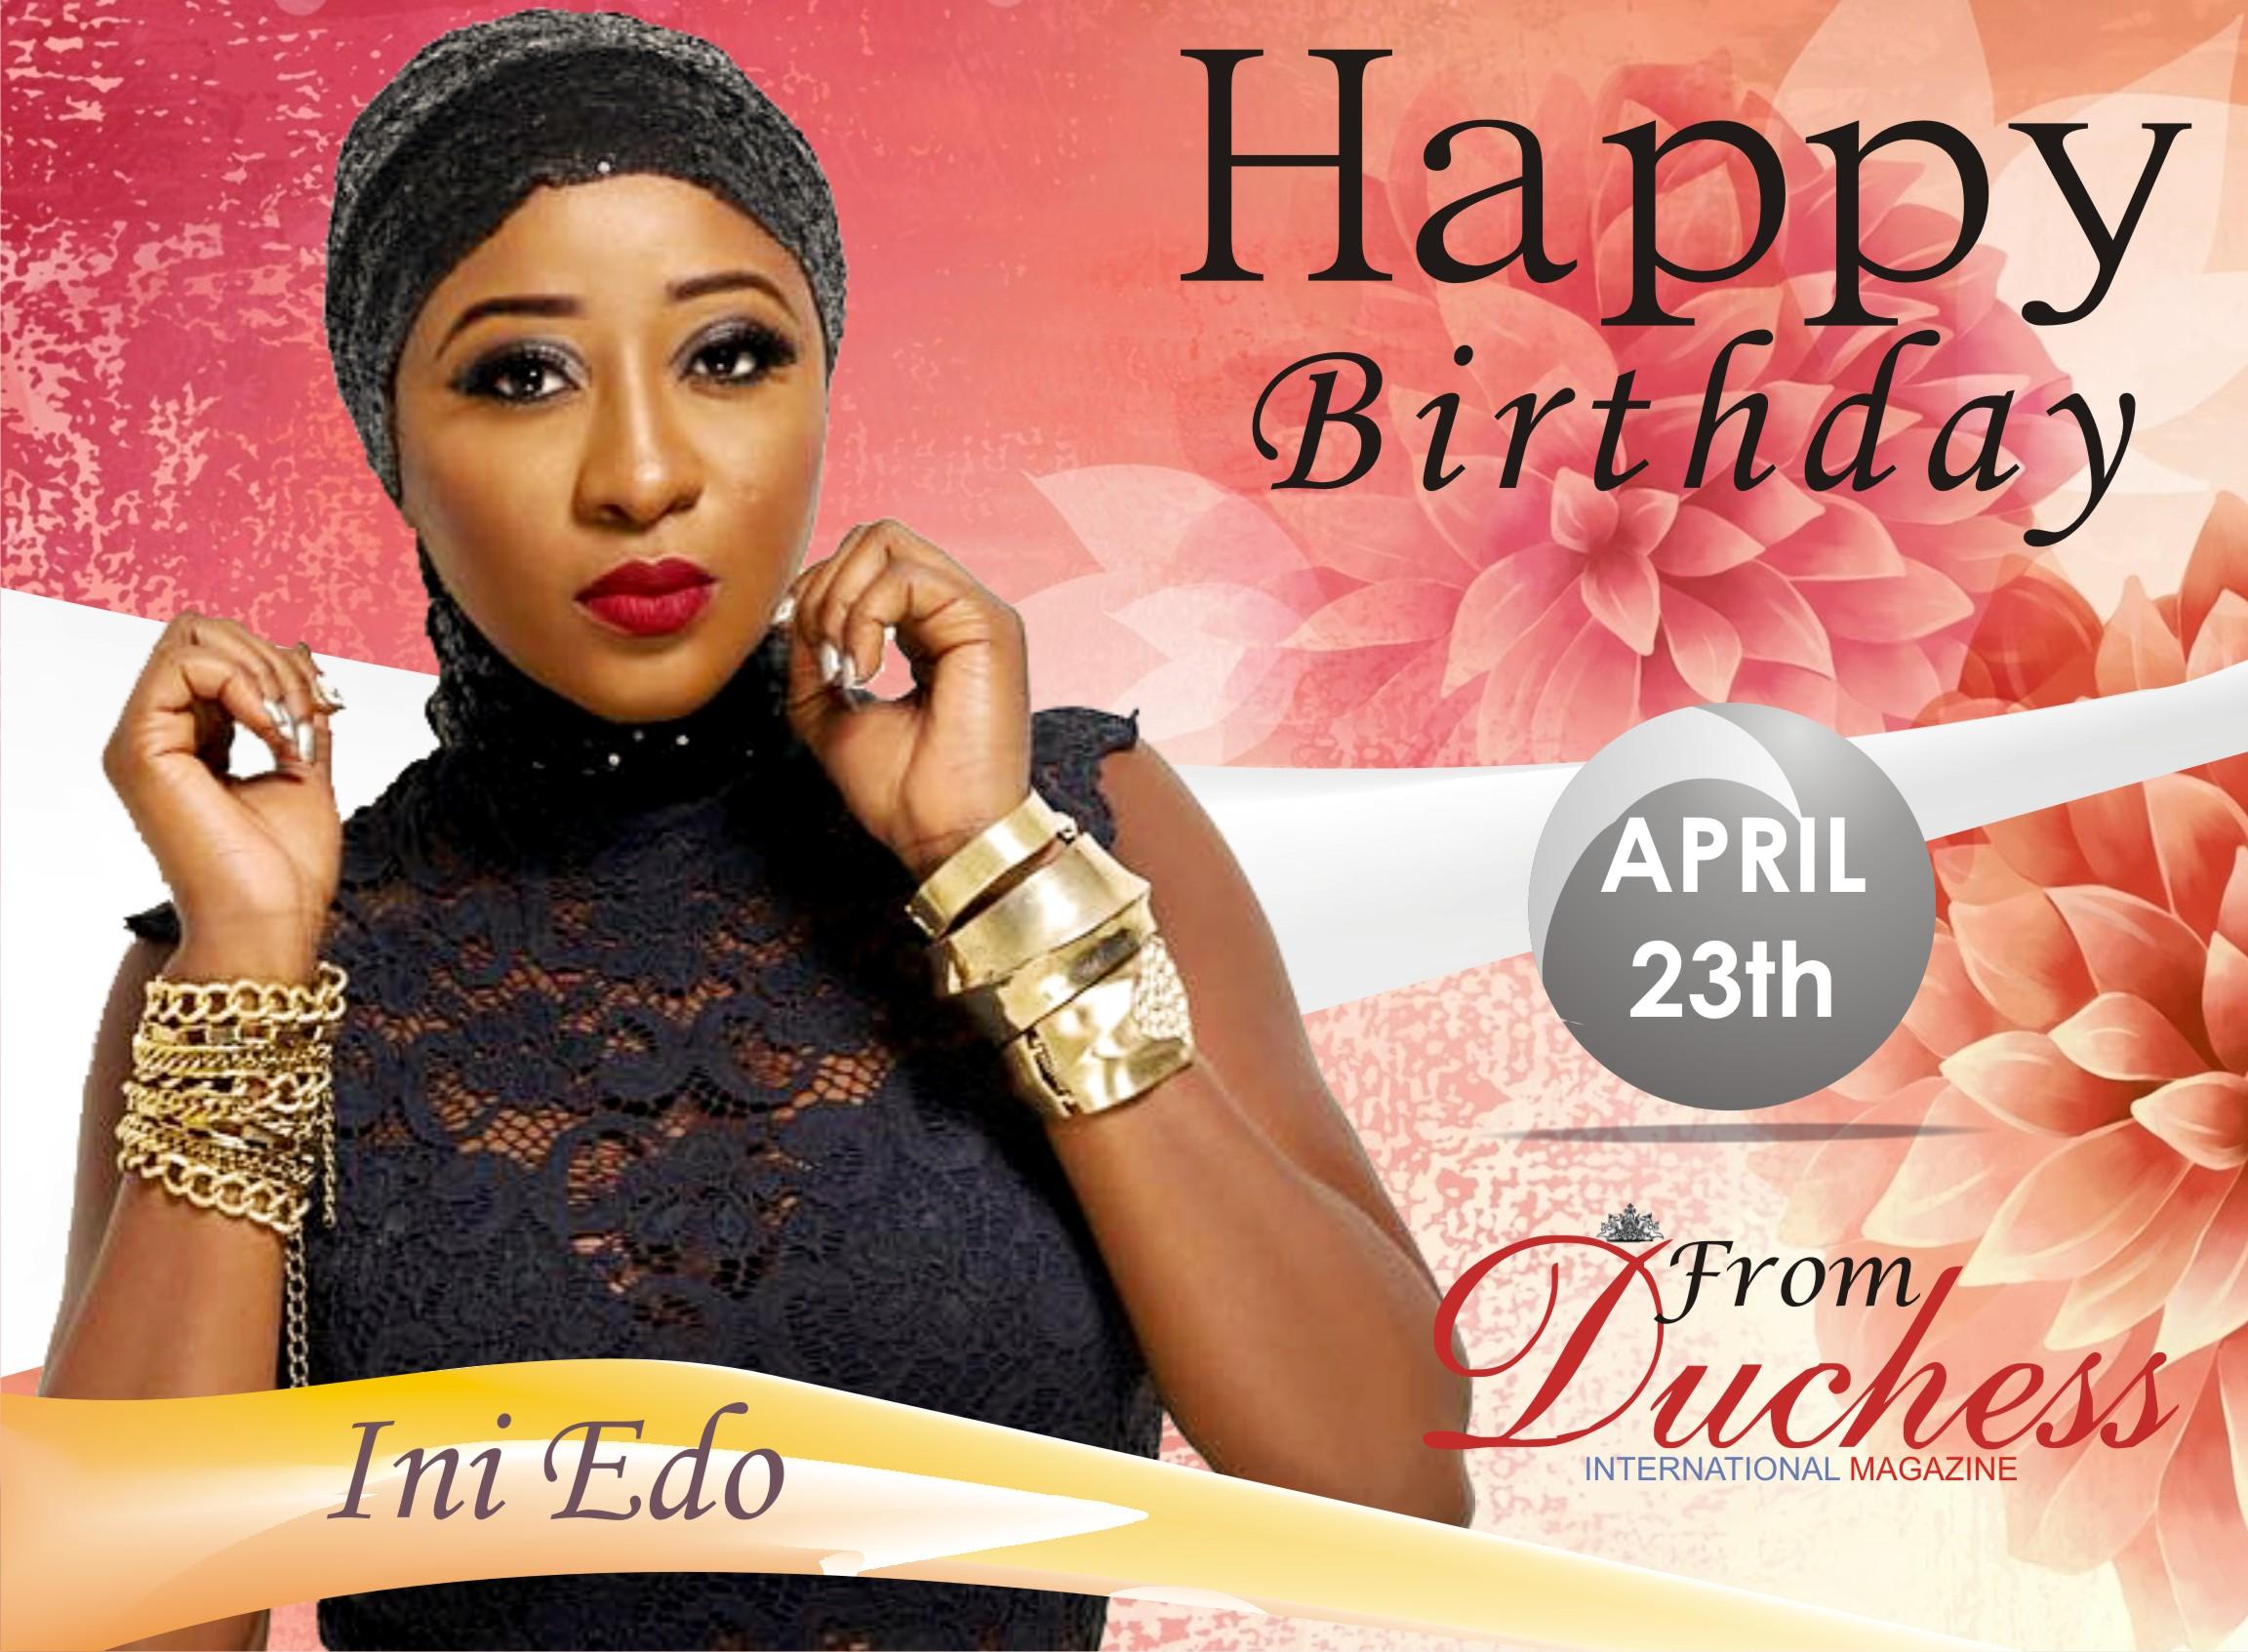 Nollywood Screen Goddess Ini Edo Turns 34 today.